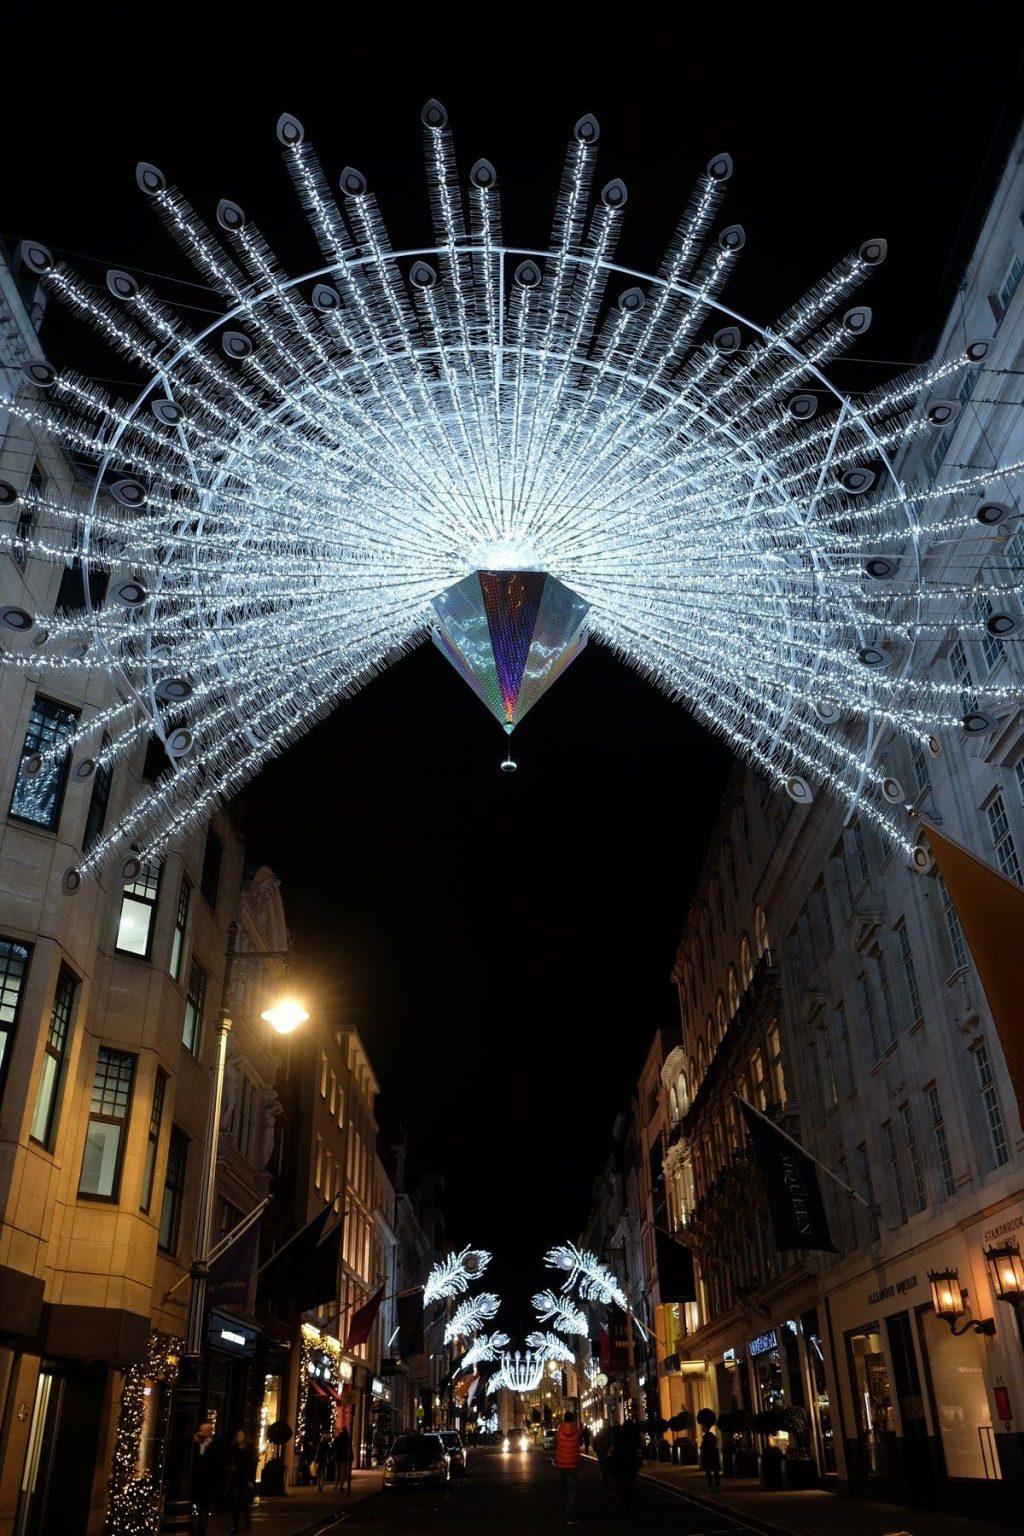 Regent Street holiday lights in London